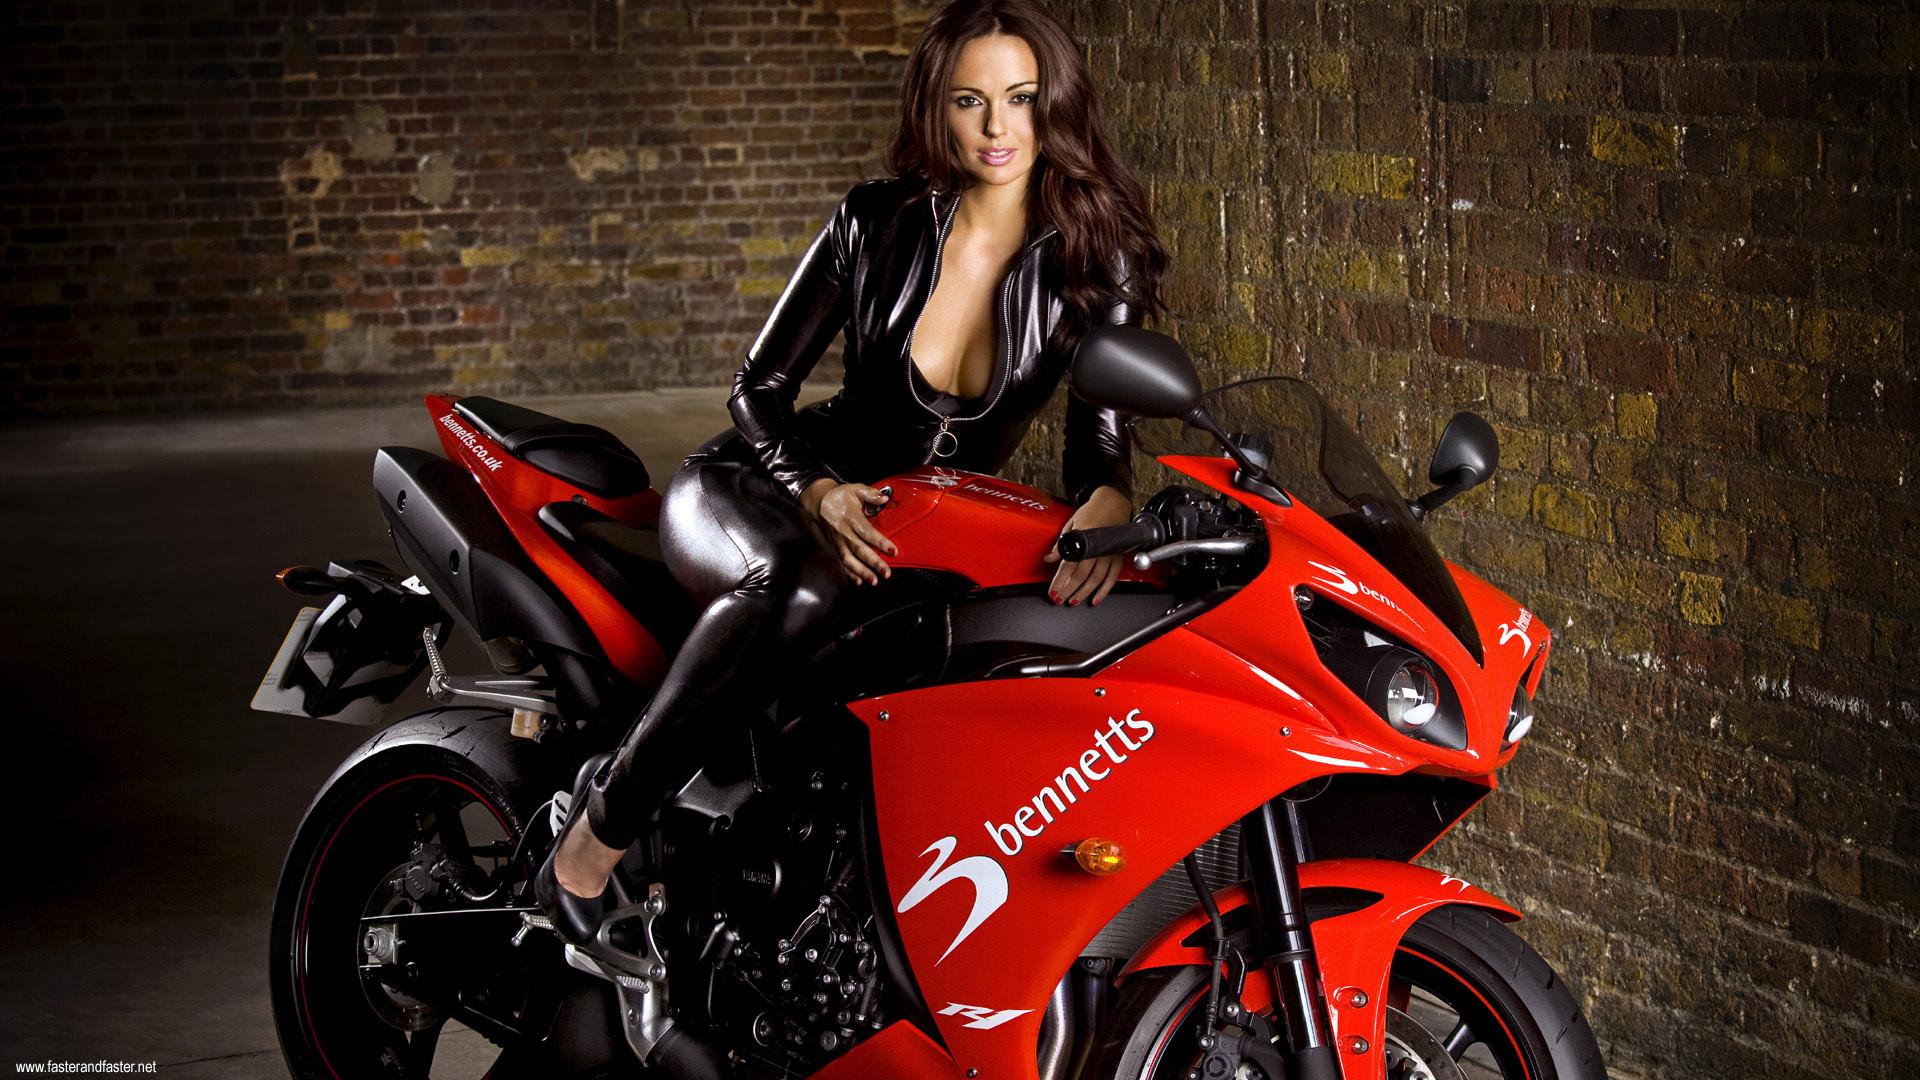 Motorcycle Girl Wallpaper: Jennifer Metcalfe HD Wallpaper